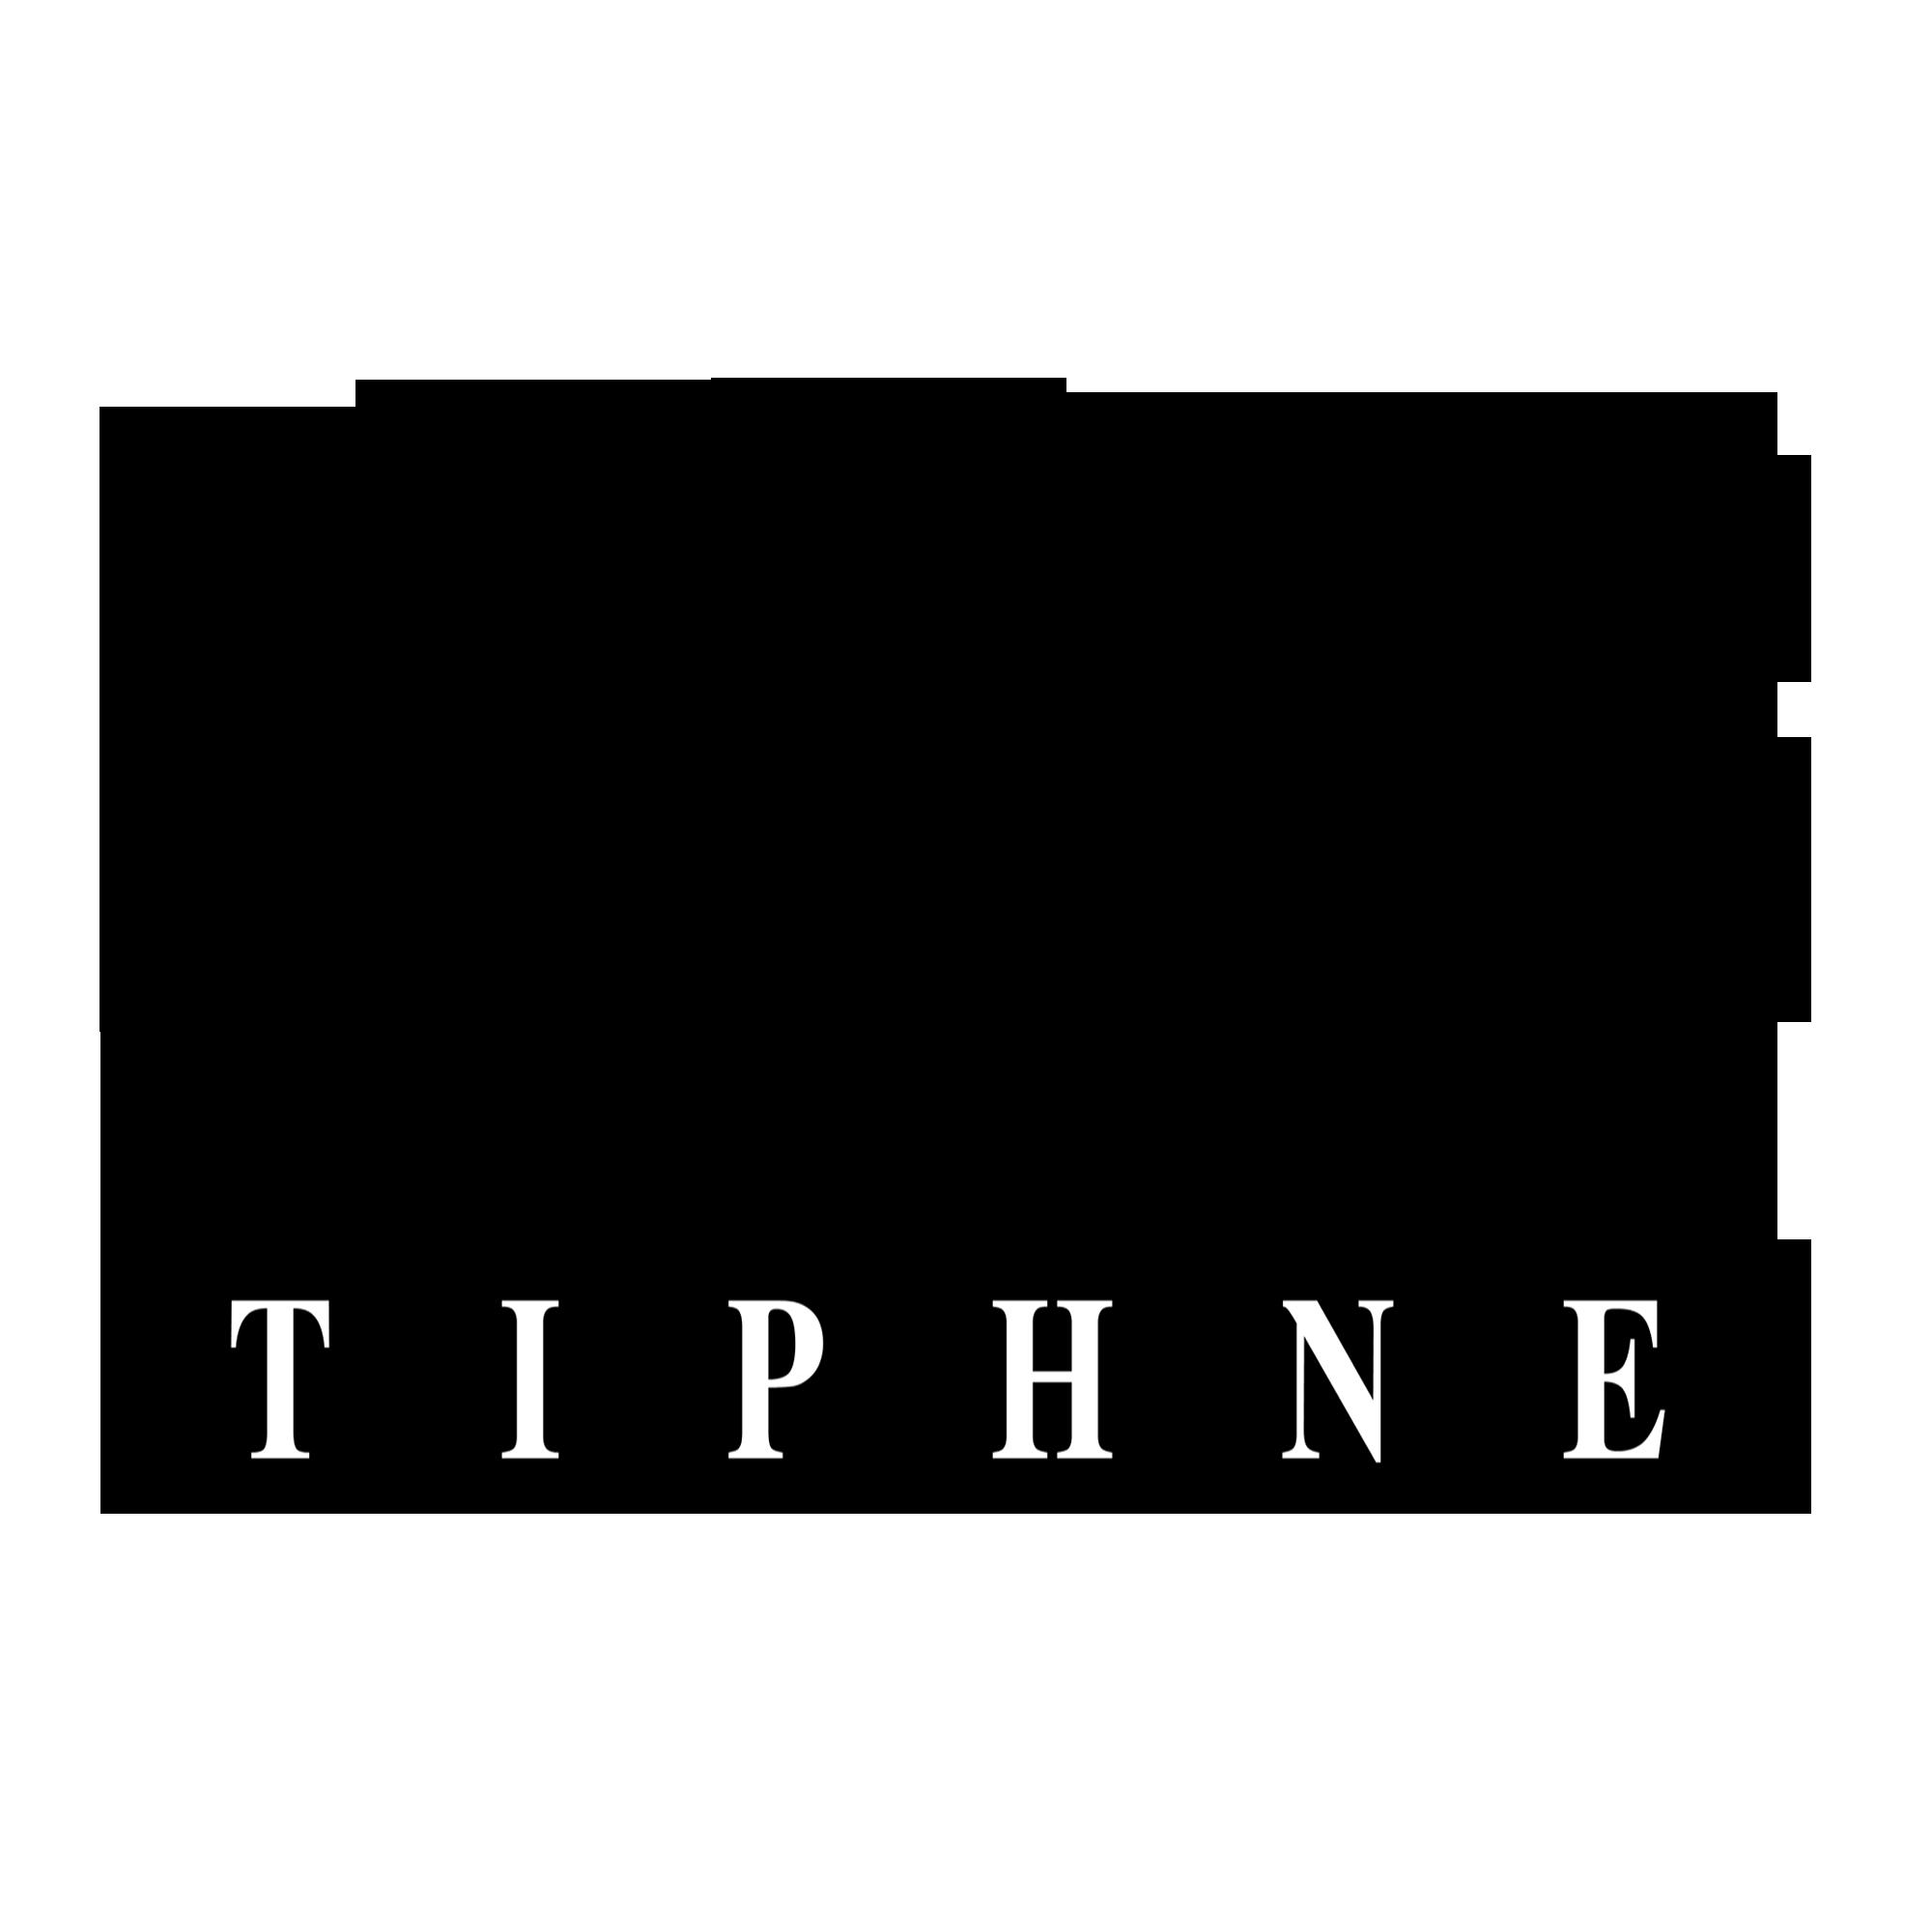 tiphne欧意韩旗舰店